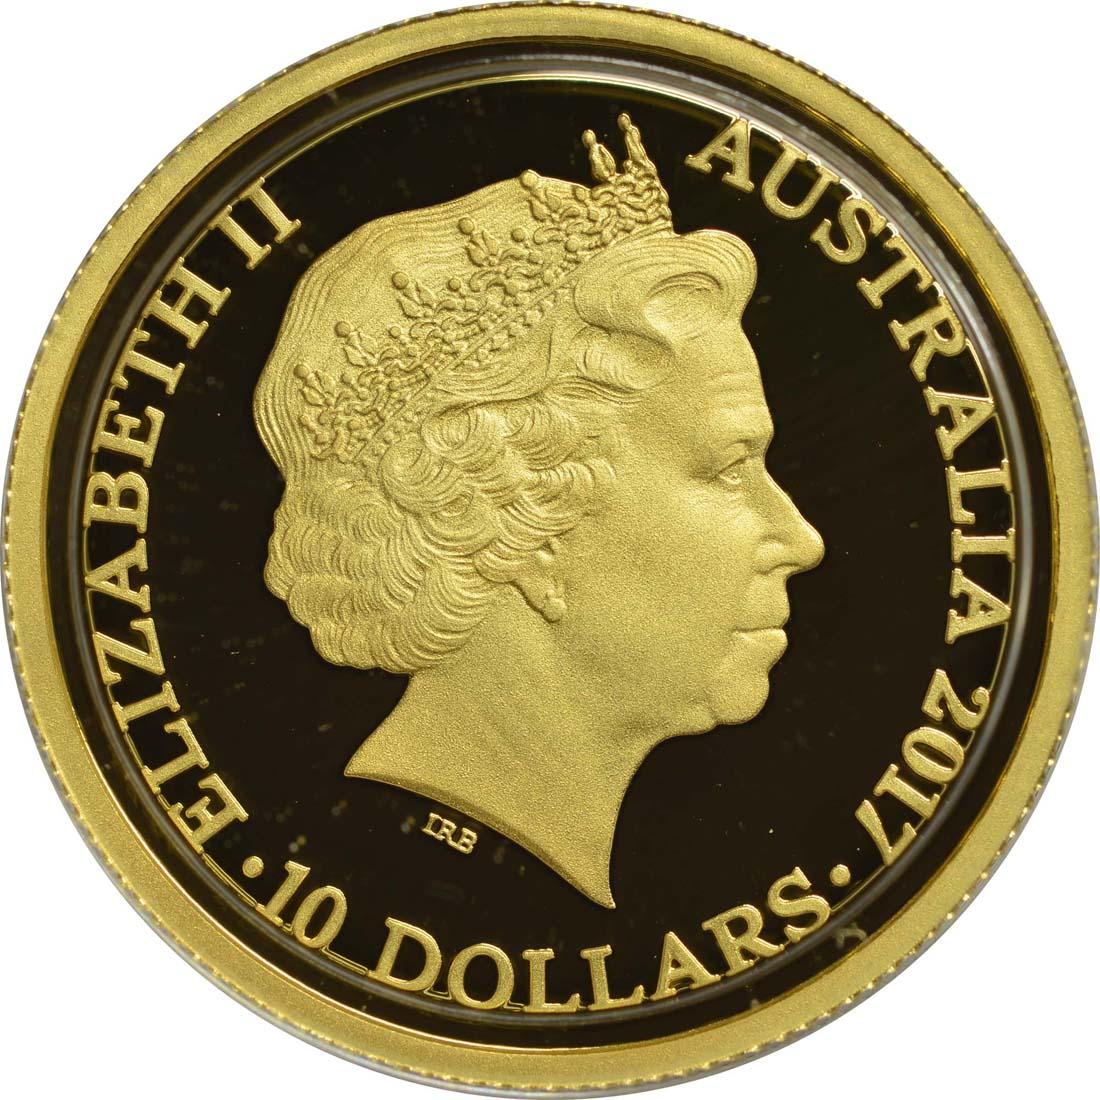 australien 10 dollar trans australian railway 2017 gold pp euro. Black Bedroom Furniture Sets. Home Design Ideas